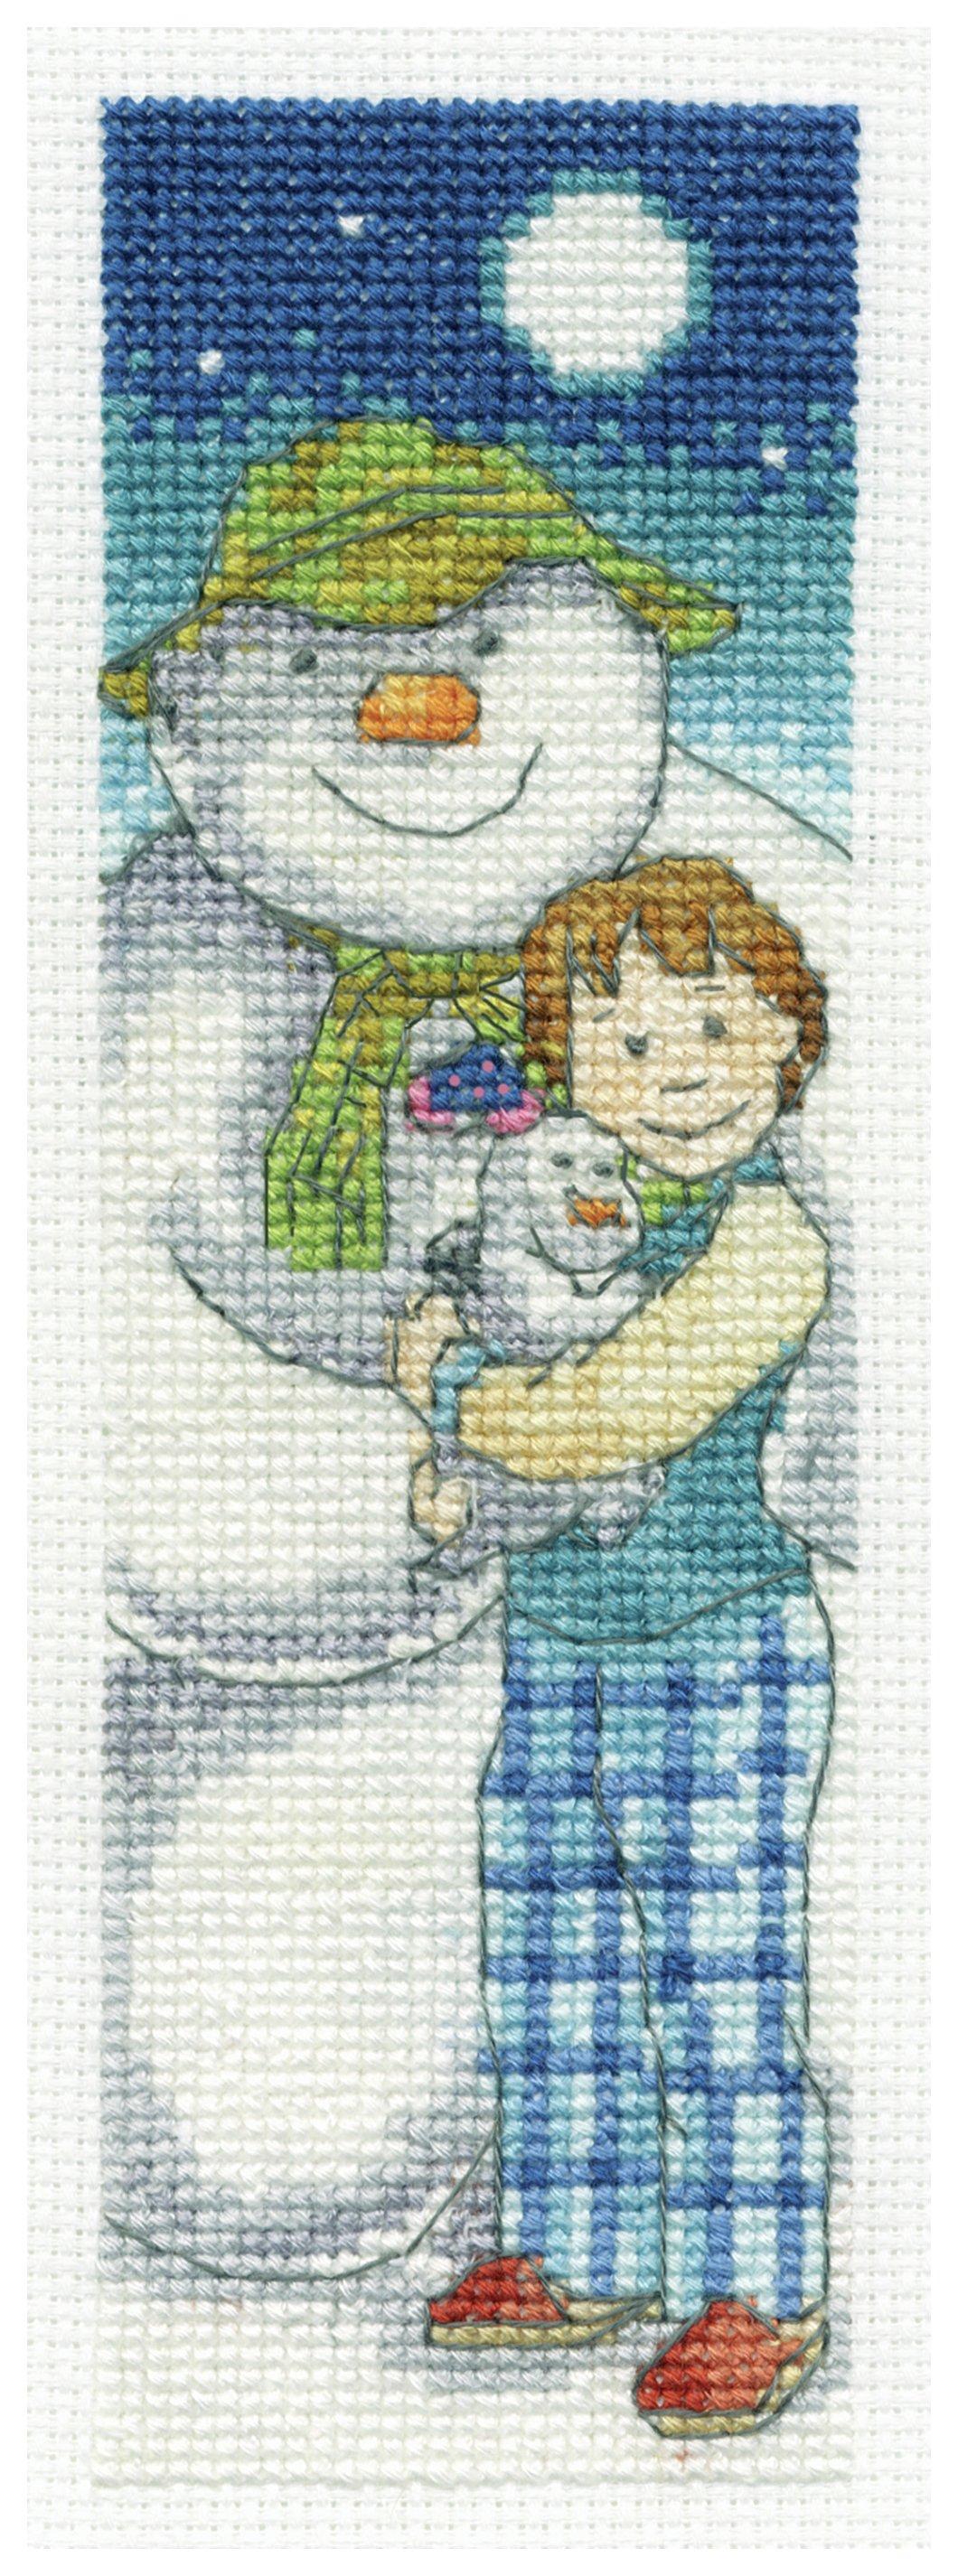 the-snowman-snowdog-moonlight-bookmark-cross-stitch-kit